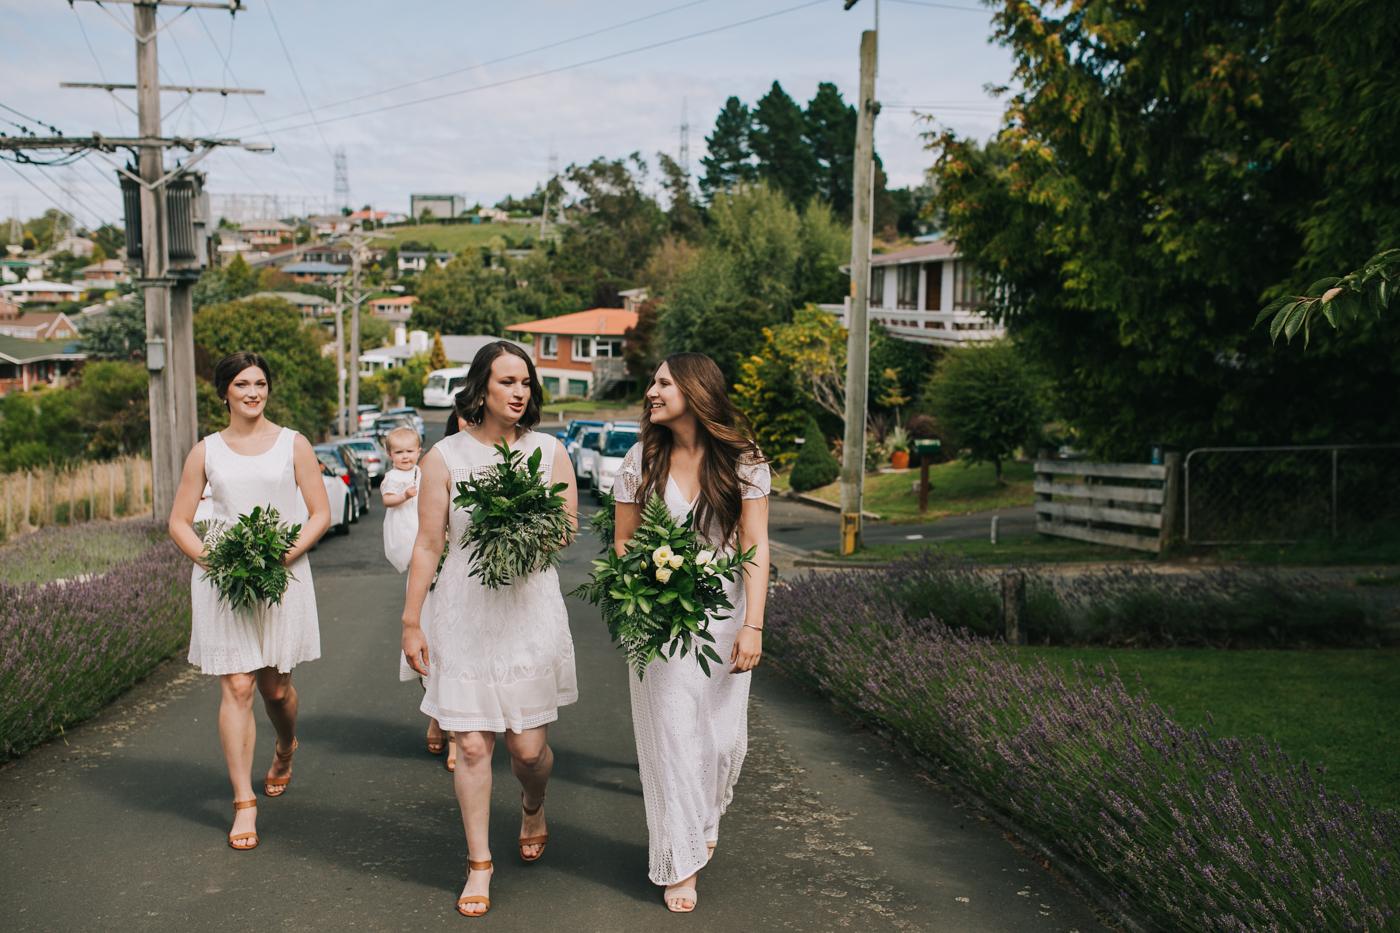 Ariana & Tim - Dunedin, New Zealand Wedding - Destination Wedding - Samantha Heather Photography-75.jpg